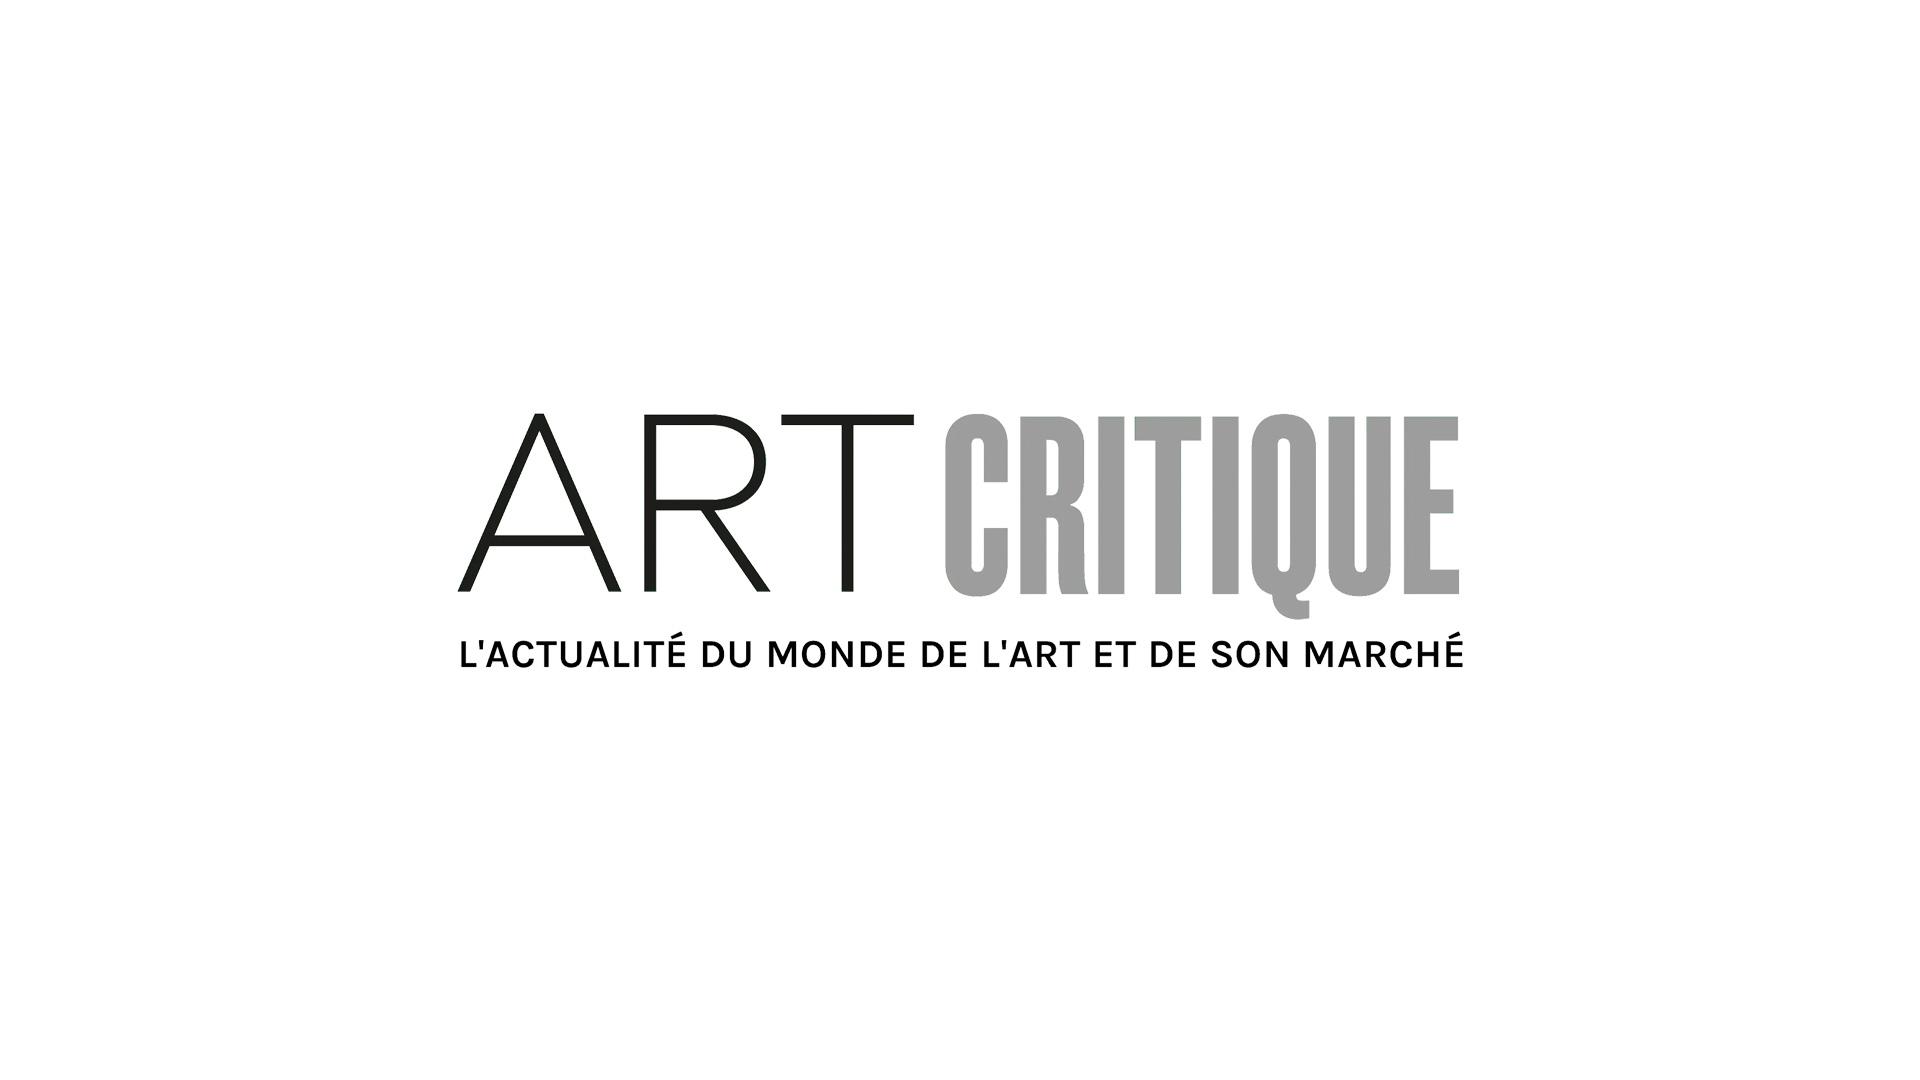 Le Grand Palais Ephémère en version augmentée